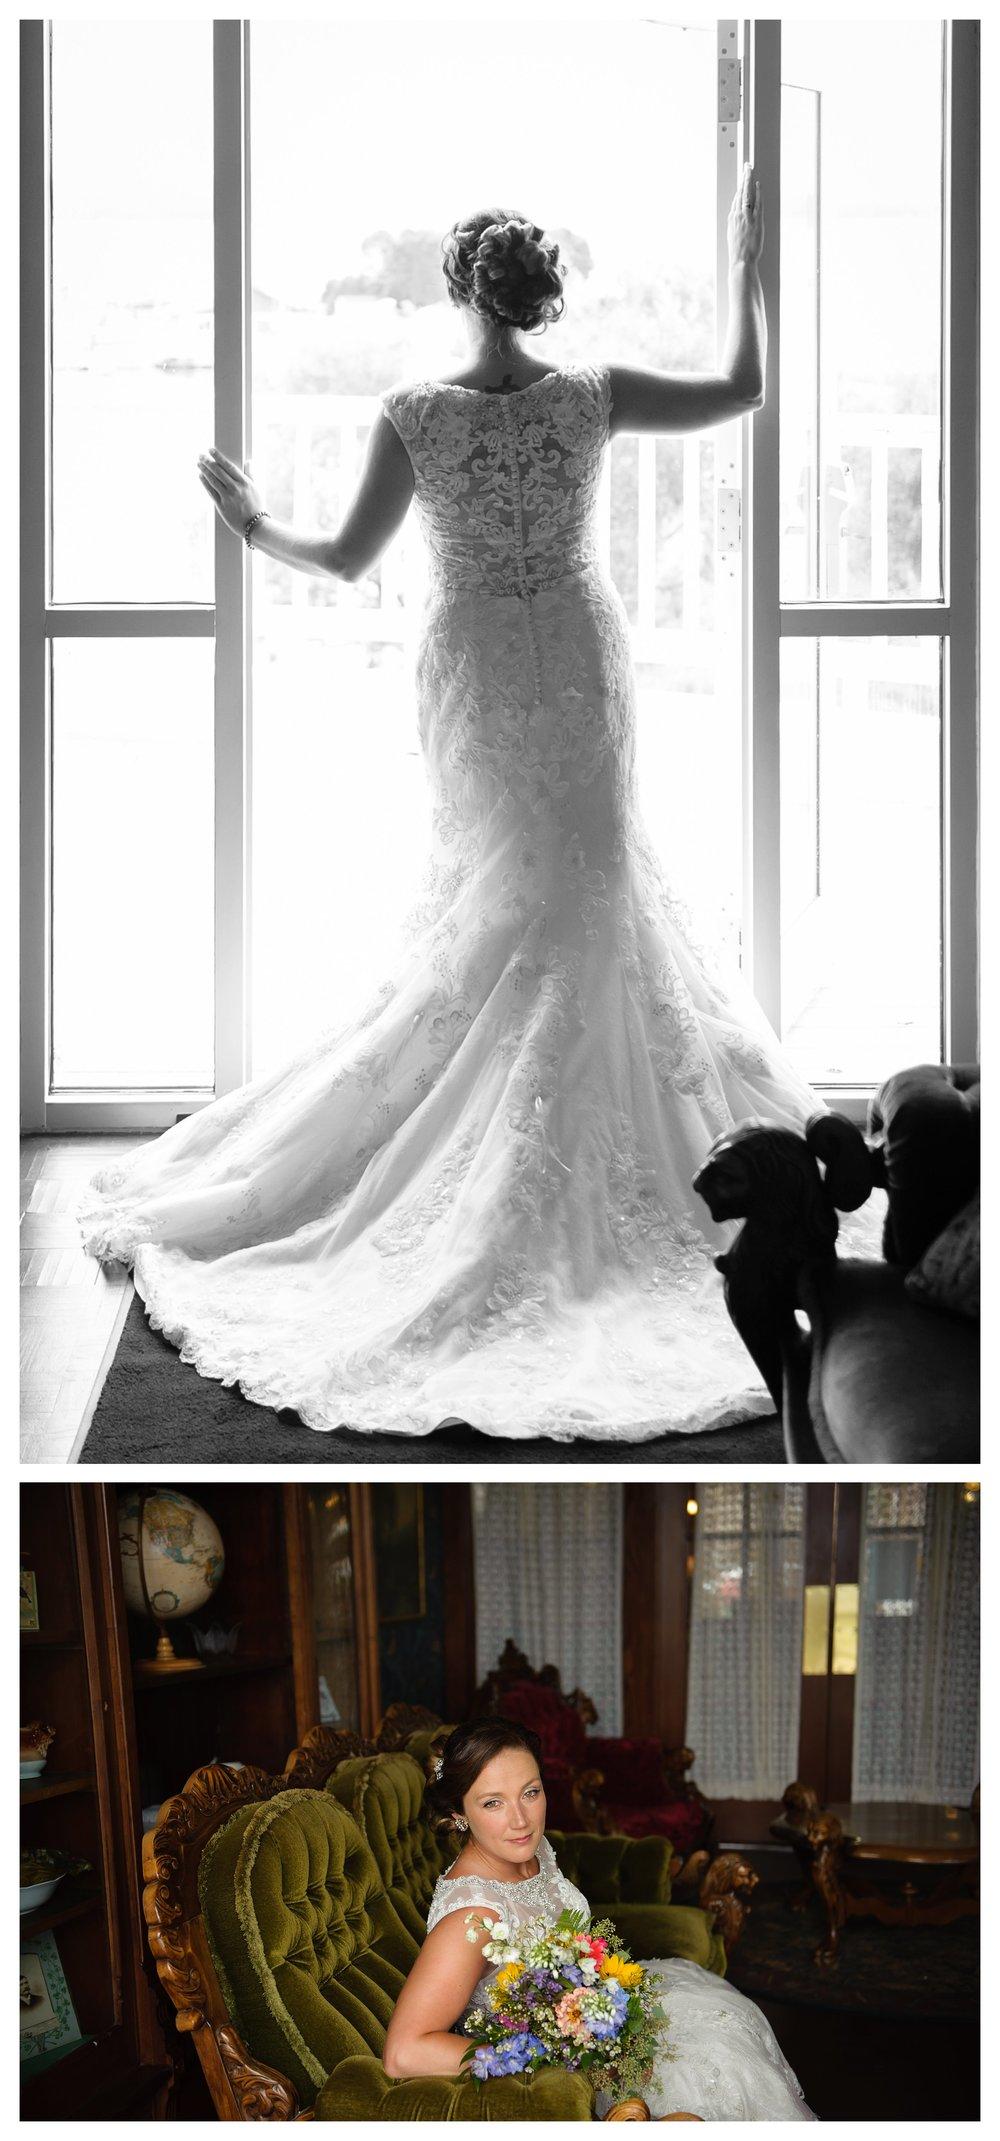 ps 139 photography jen jensen ashland freehands farm wedding northwoods_0024.jpg